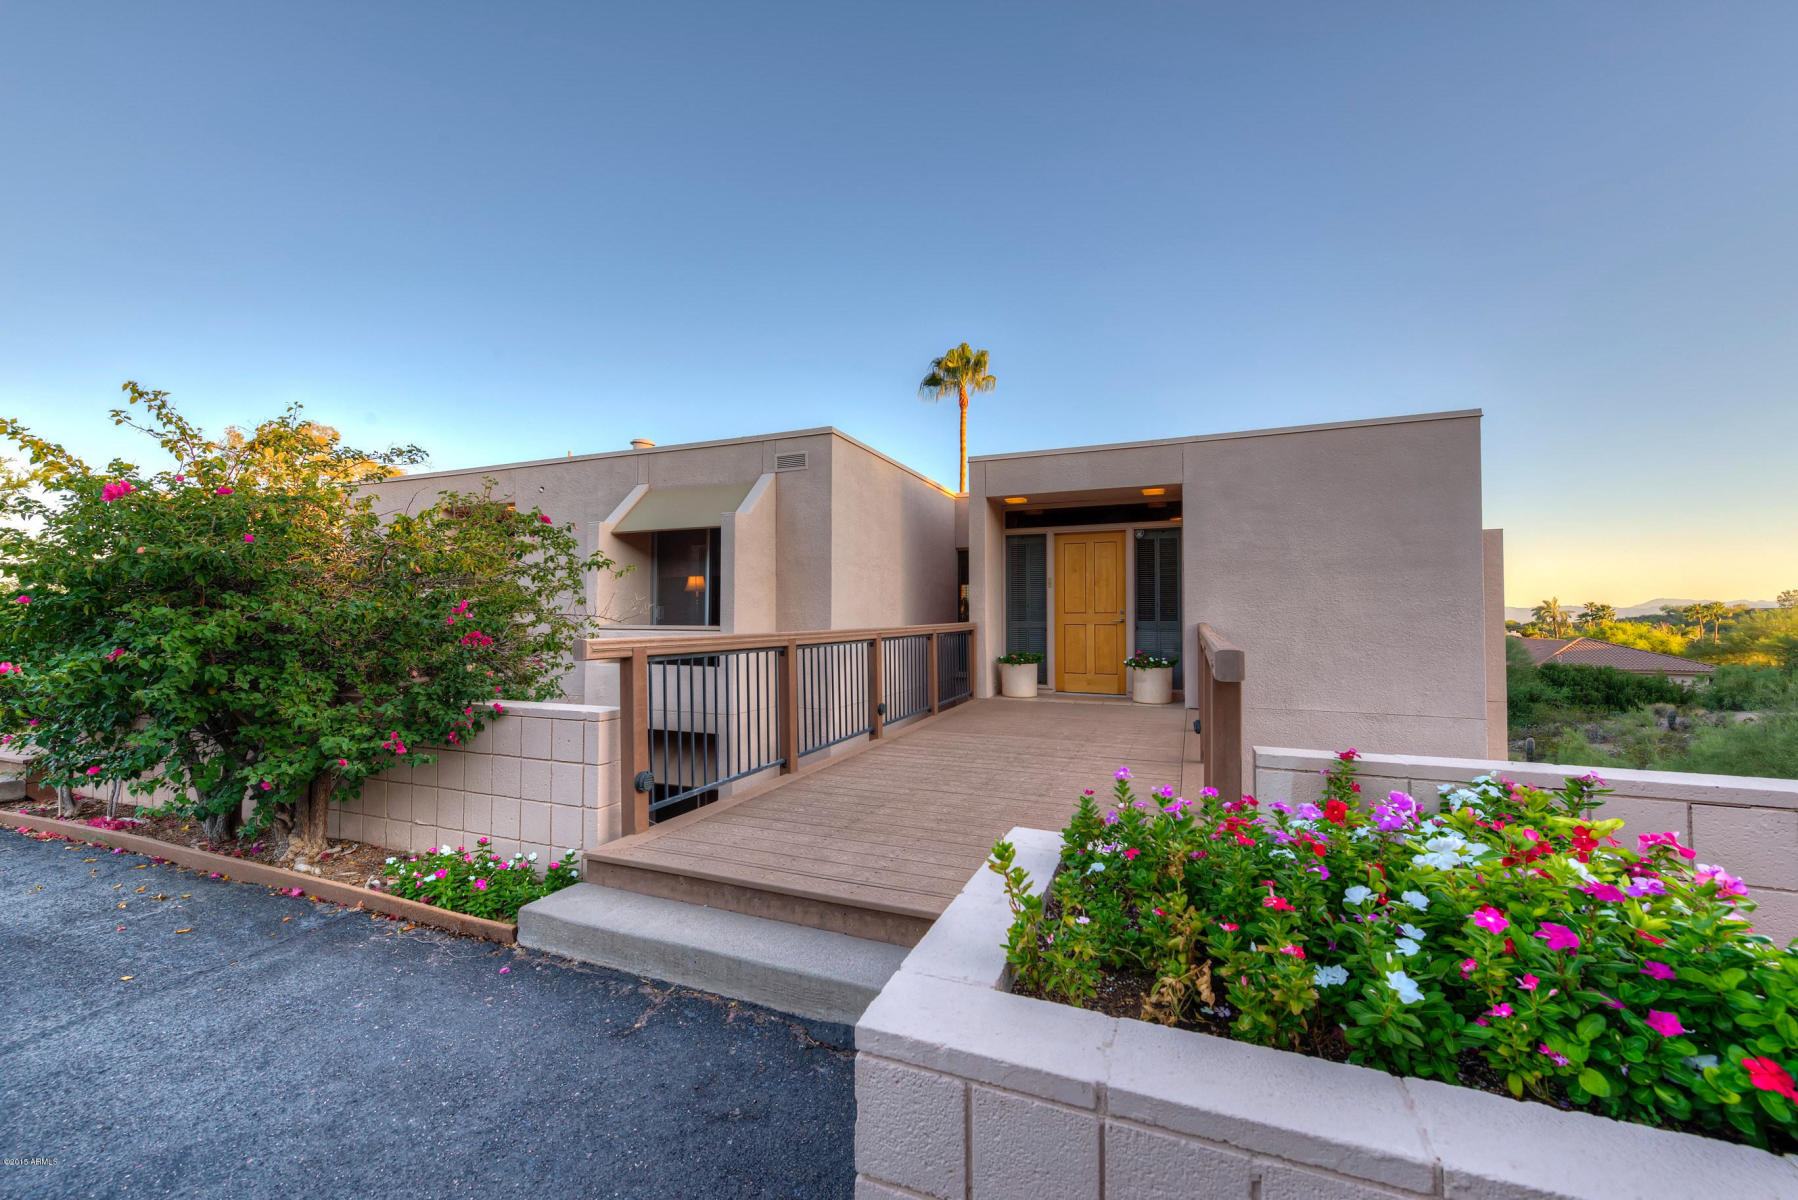 4237 E Highlands Dr, Paradise Valley | $975,000